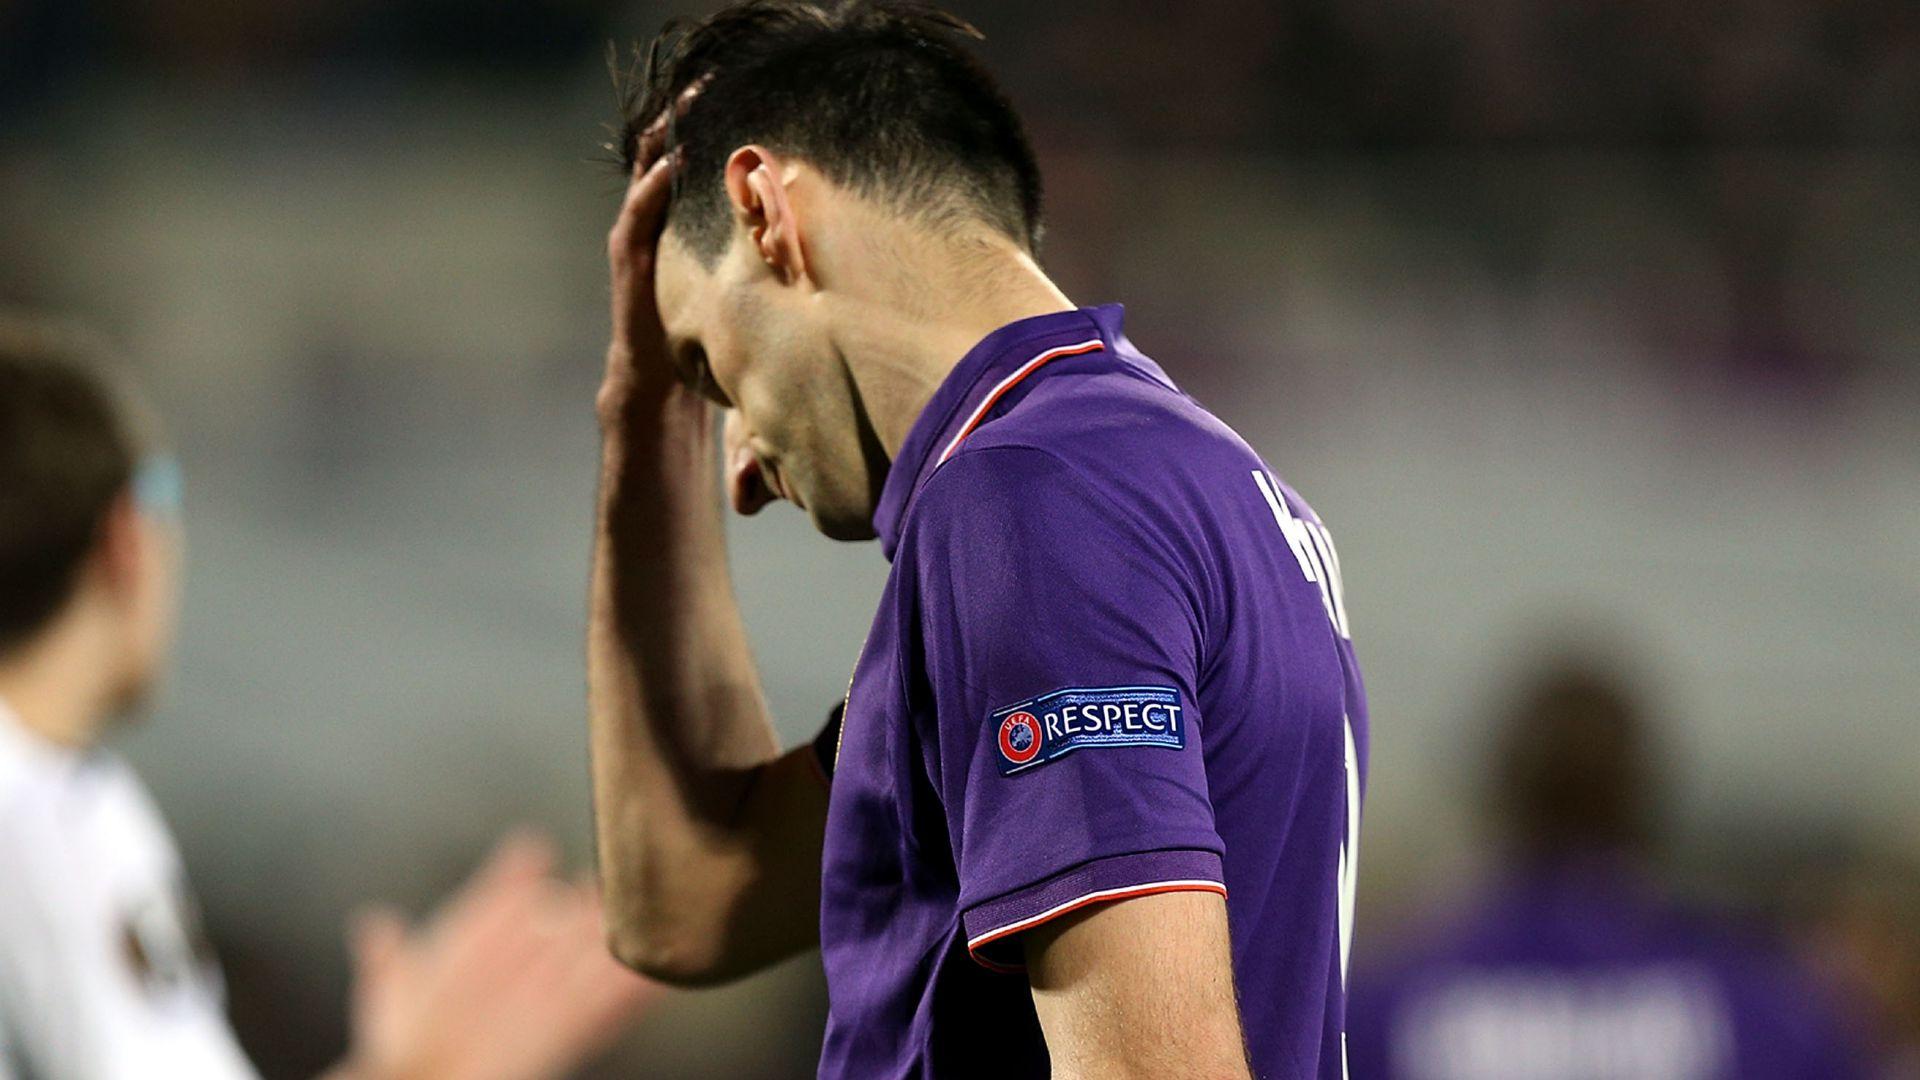 Fiorentina, Sousa nel post partita: